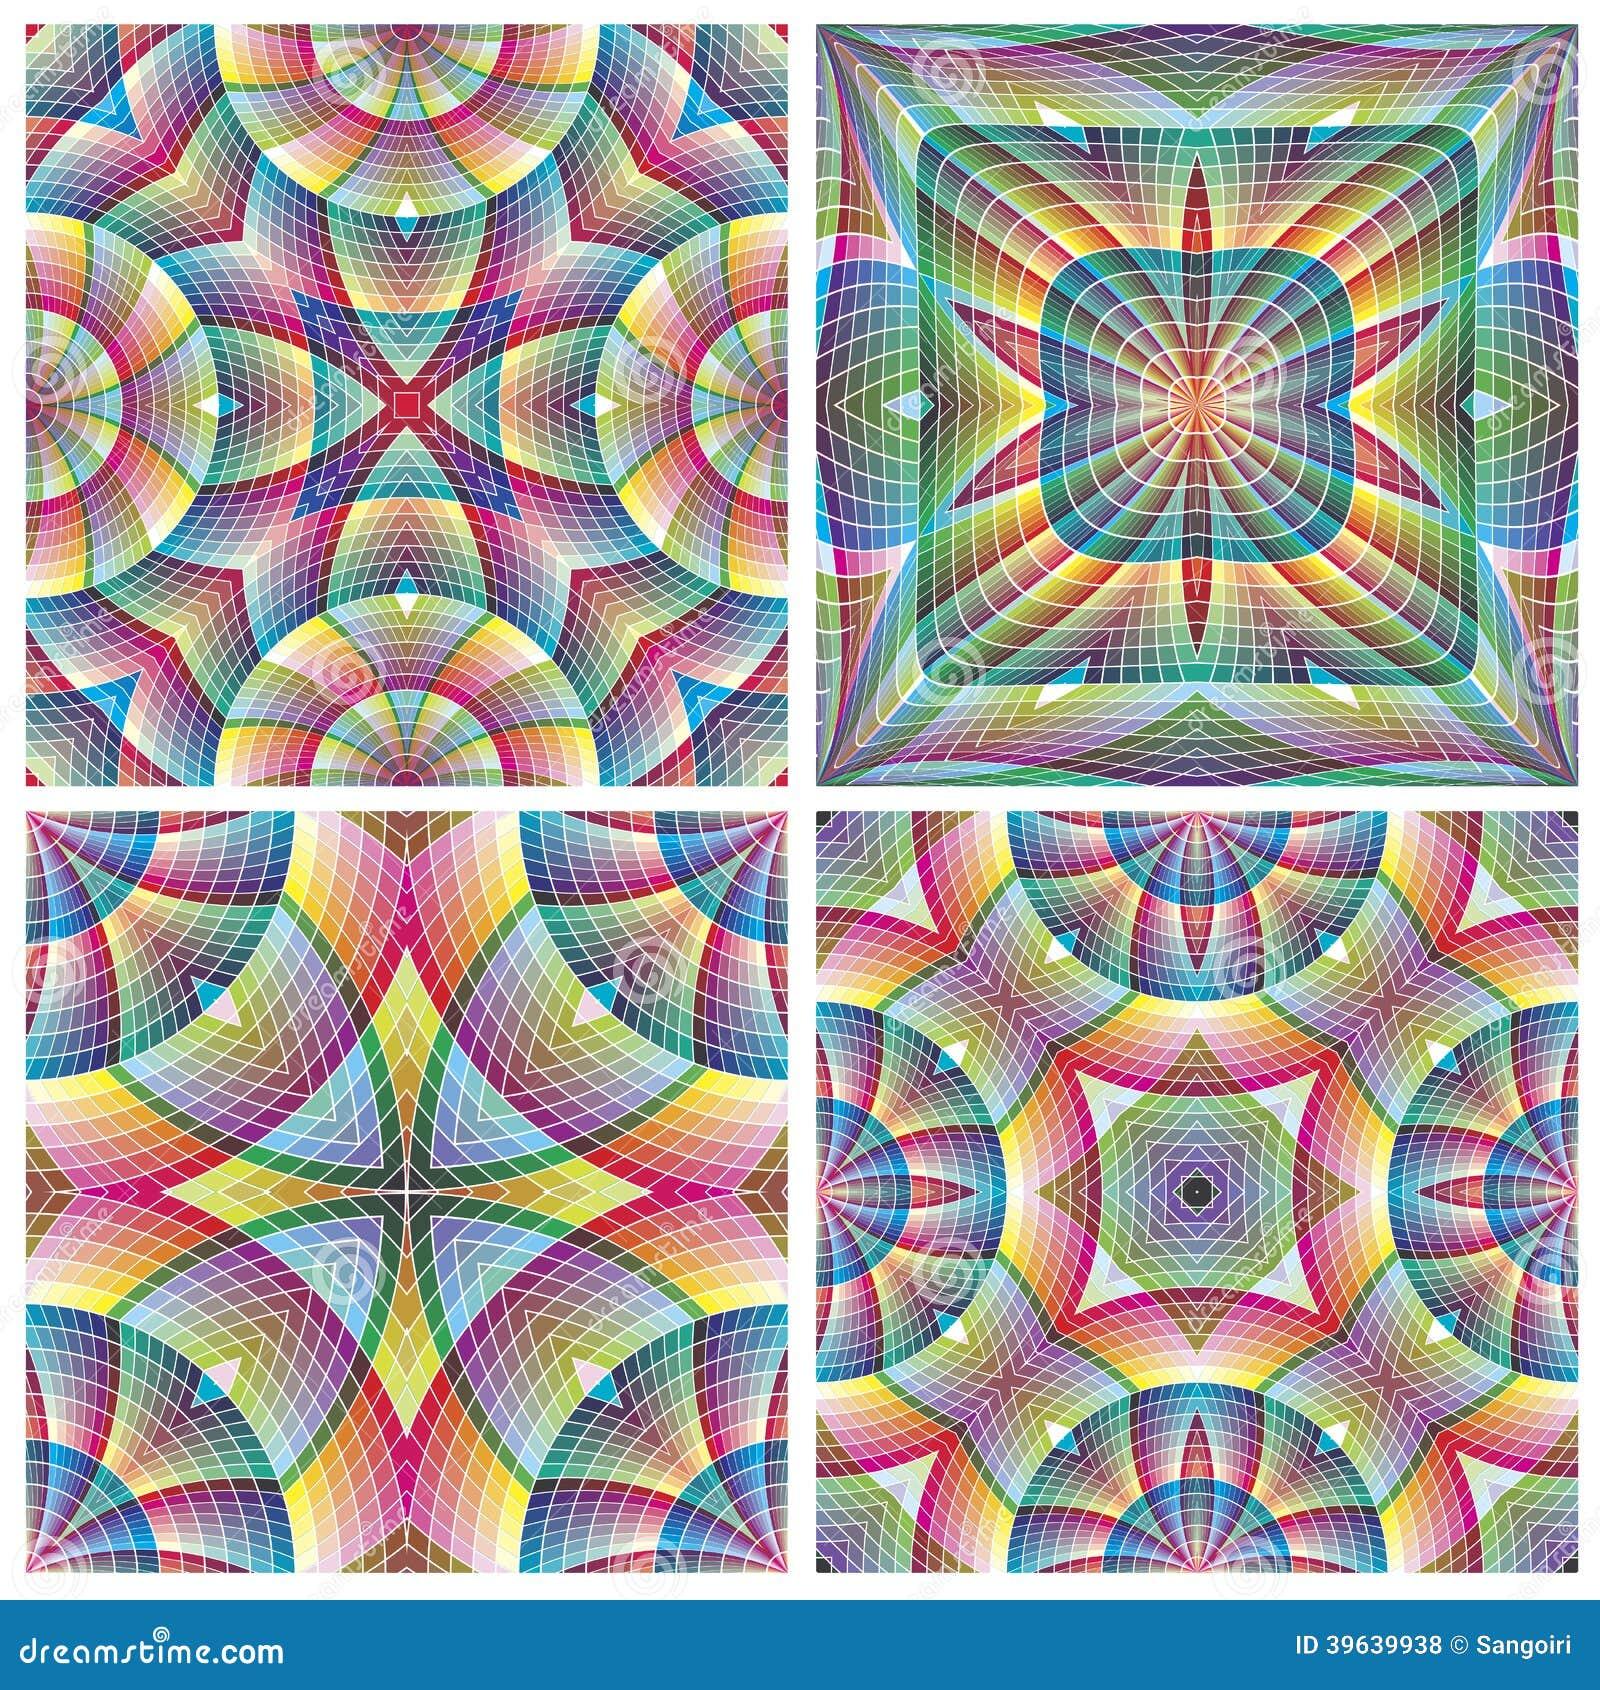 wavelet based image fusion techniques VpgZ90